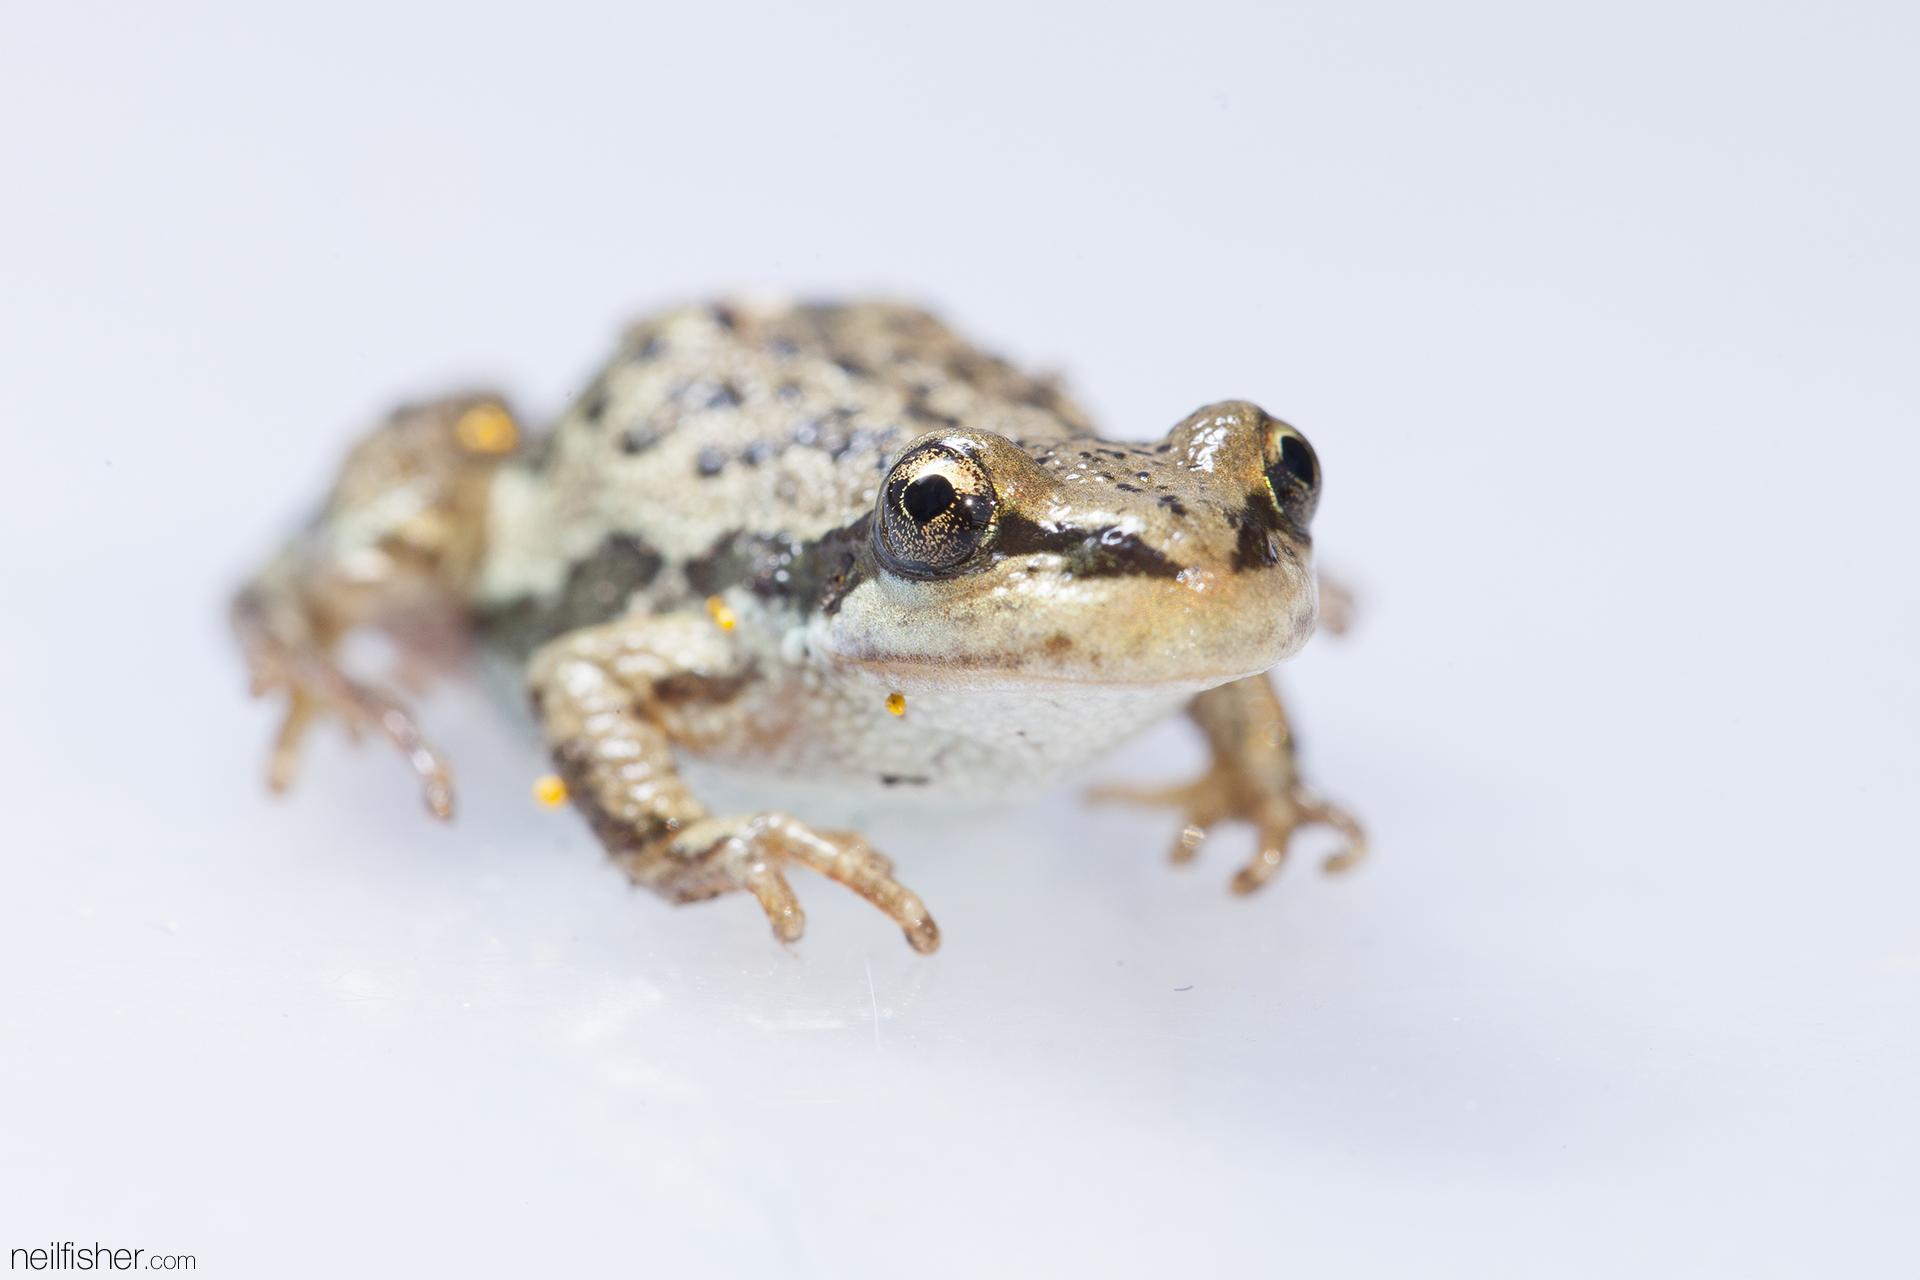 Boreal chorus frog (Pseudacris maculata) EXIF 1/160sec f/11.0 ISO200 100mm